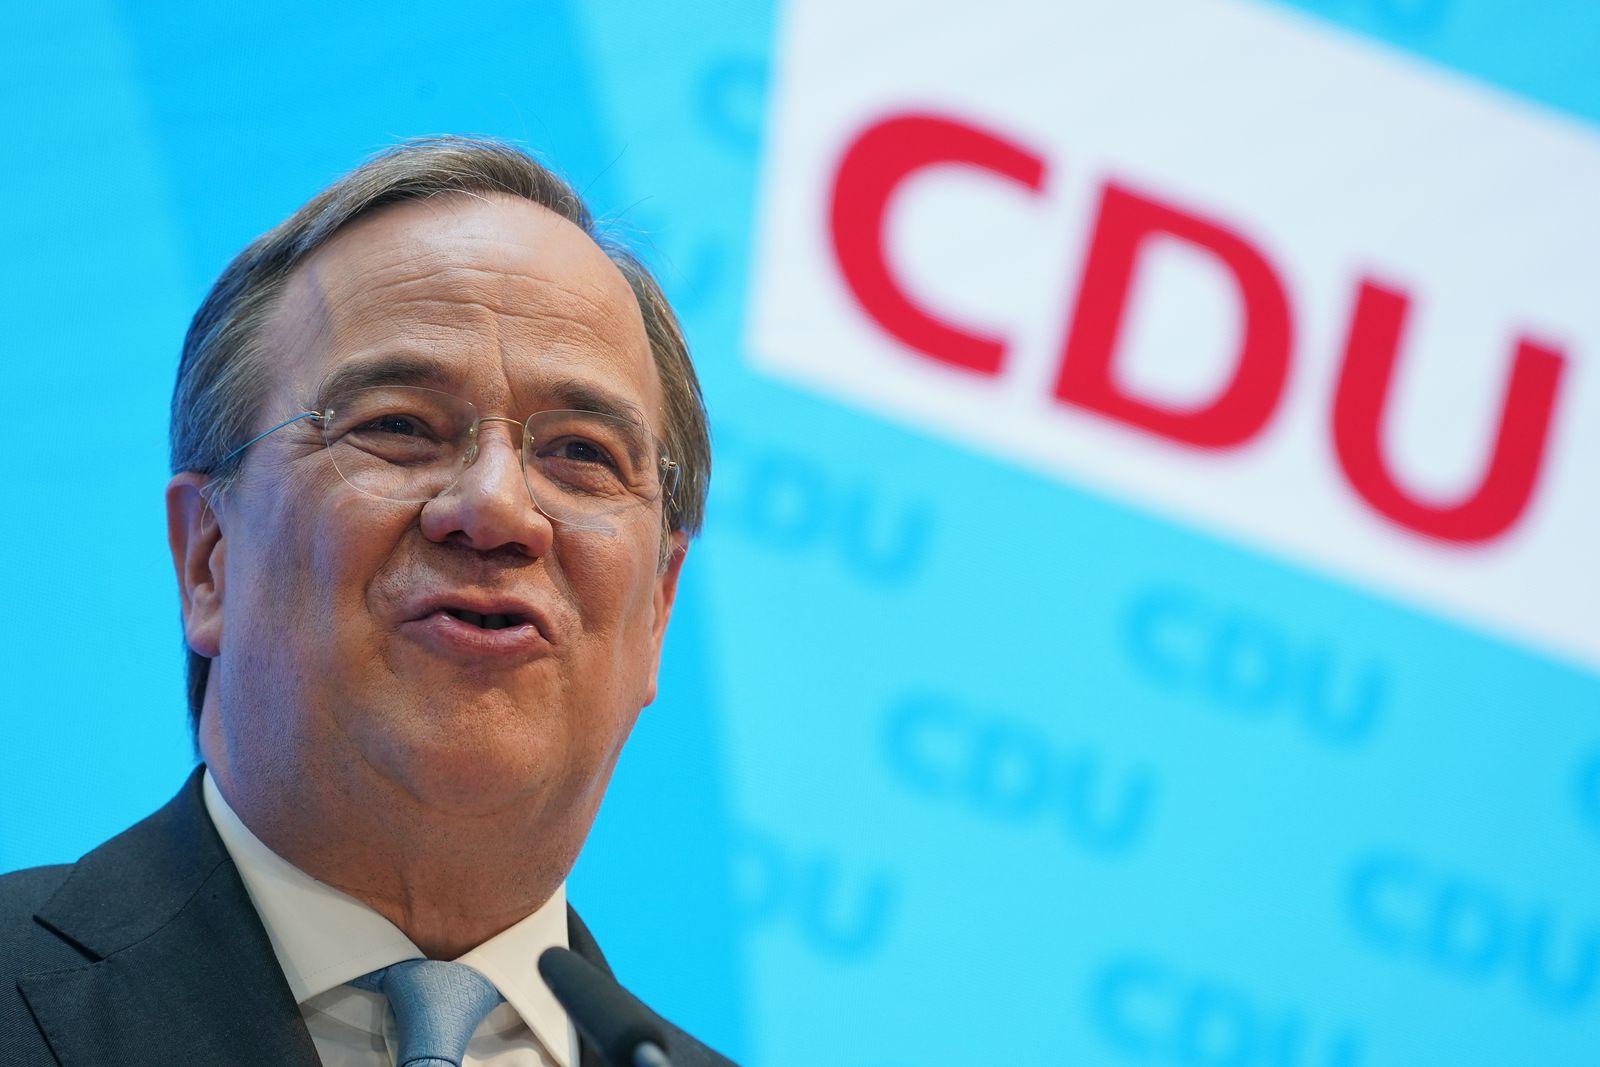 Laschet Speaks Following Confirmation As CDU/CSU Chancellor Candidate